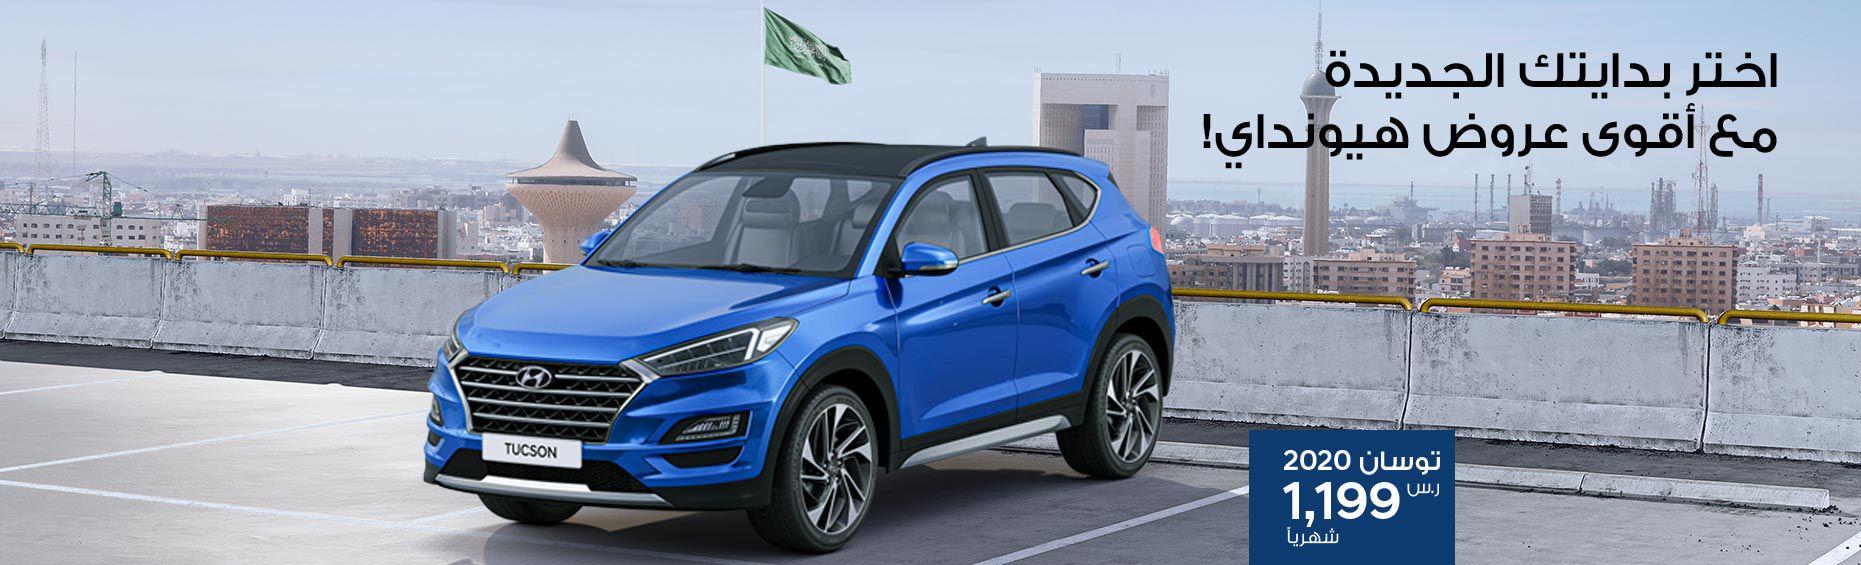 تخفيضات سيارات 2020 Hyundai Naghi